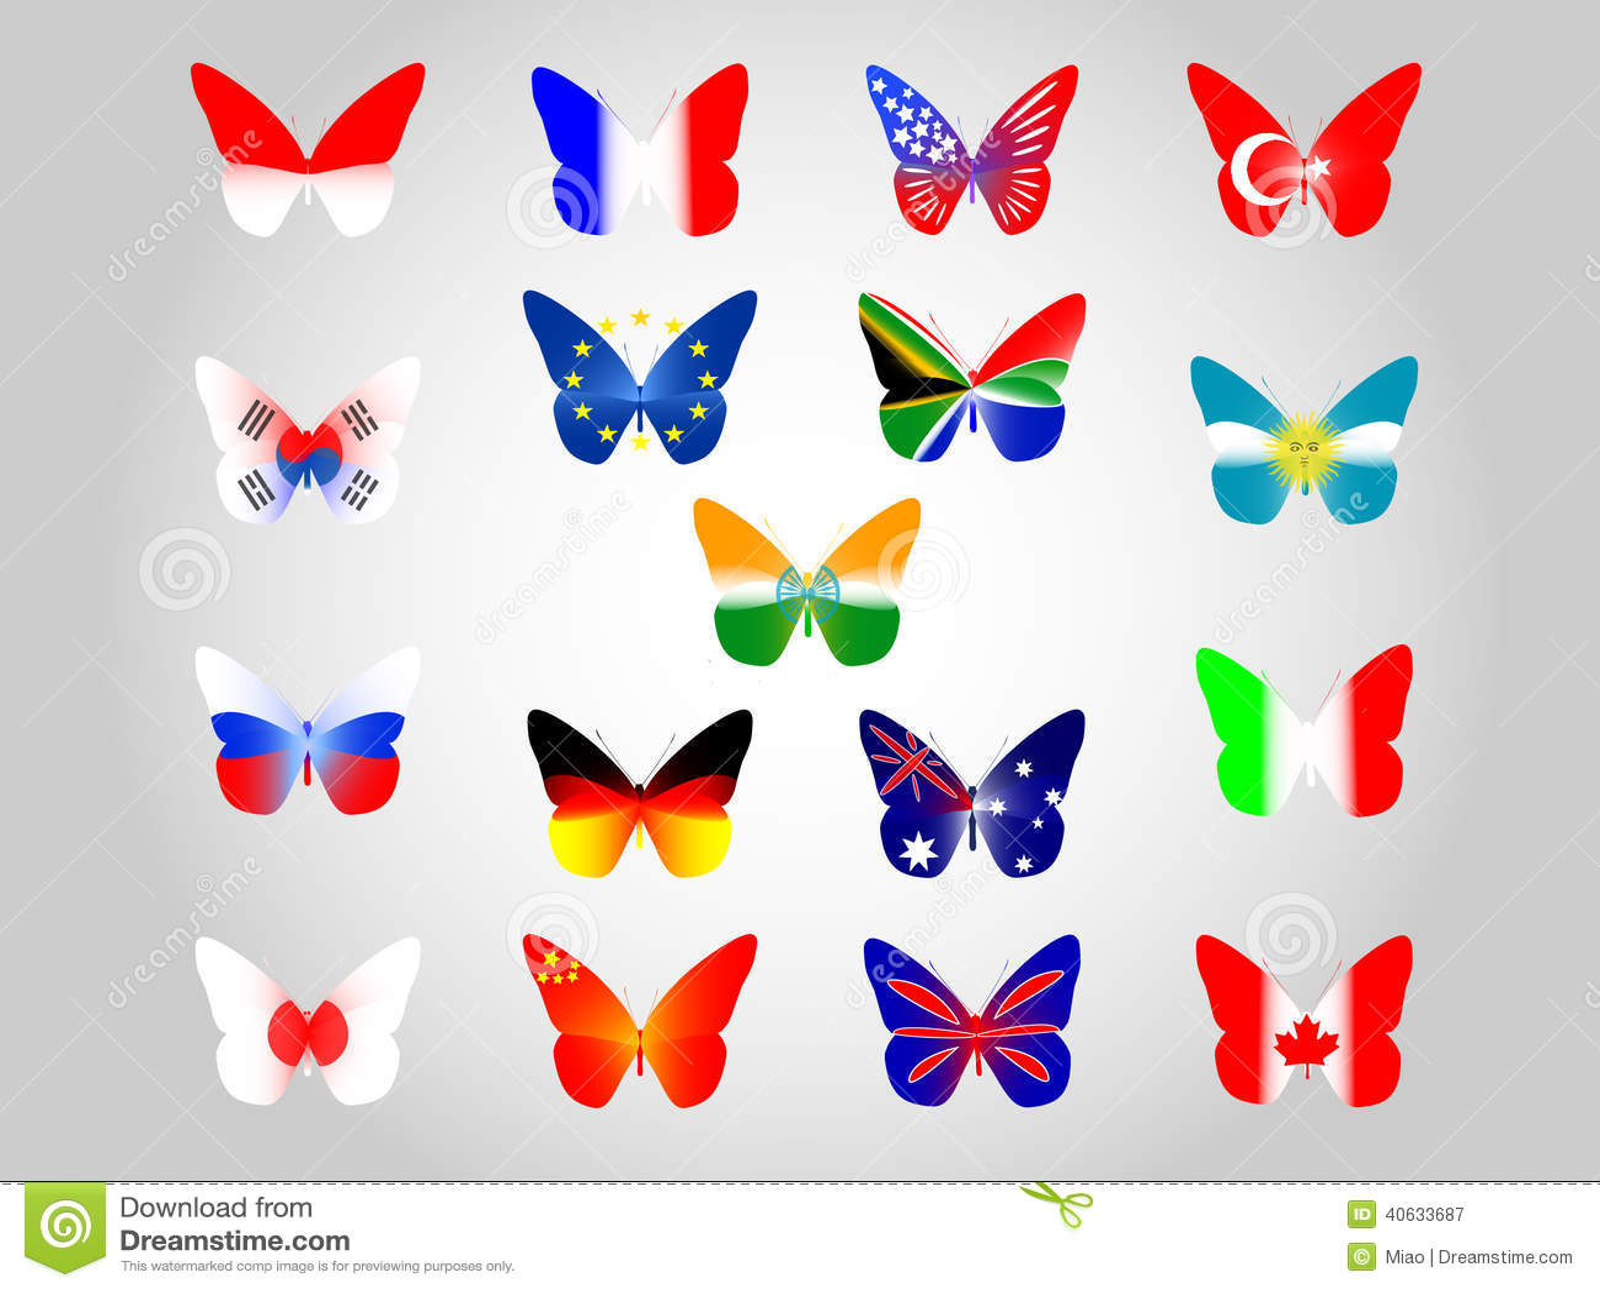 Indian Flag Butterflies: National Flags Stock Vector